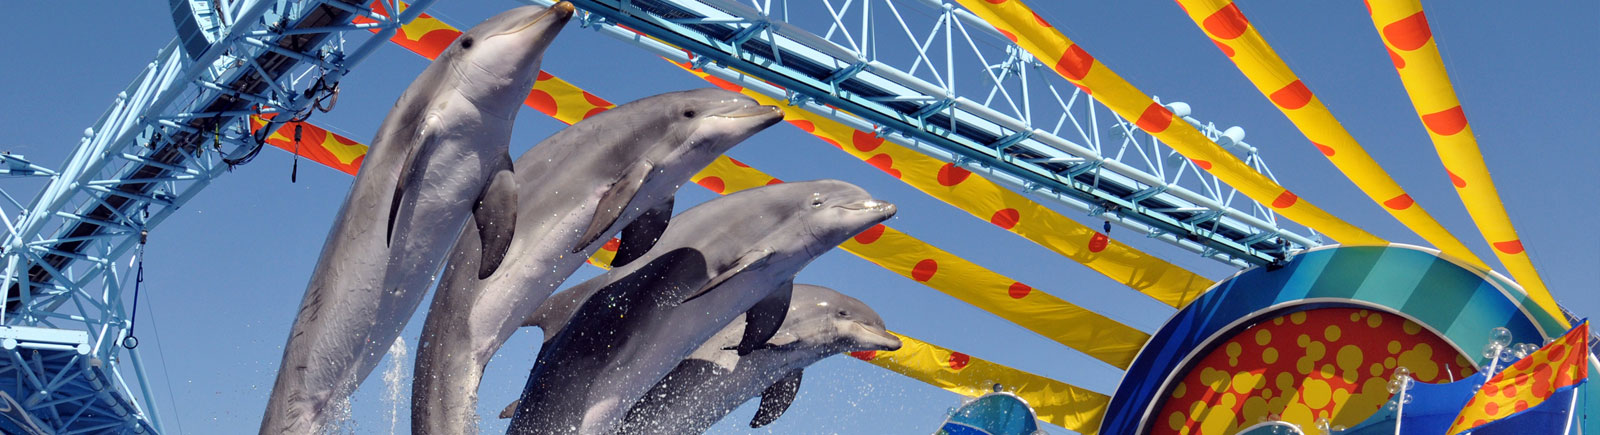 San Diego Theme Parks California